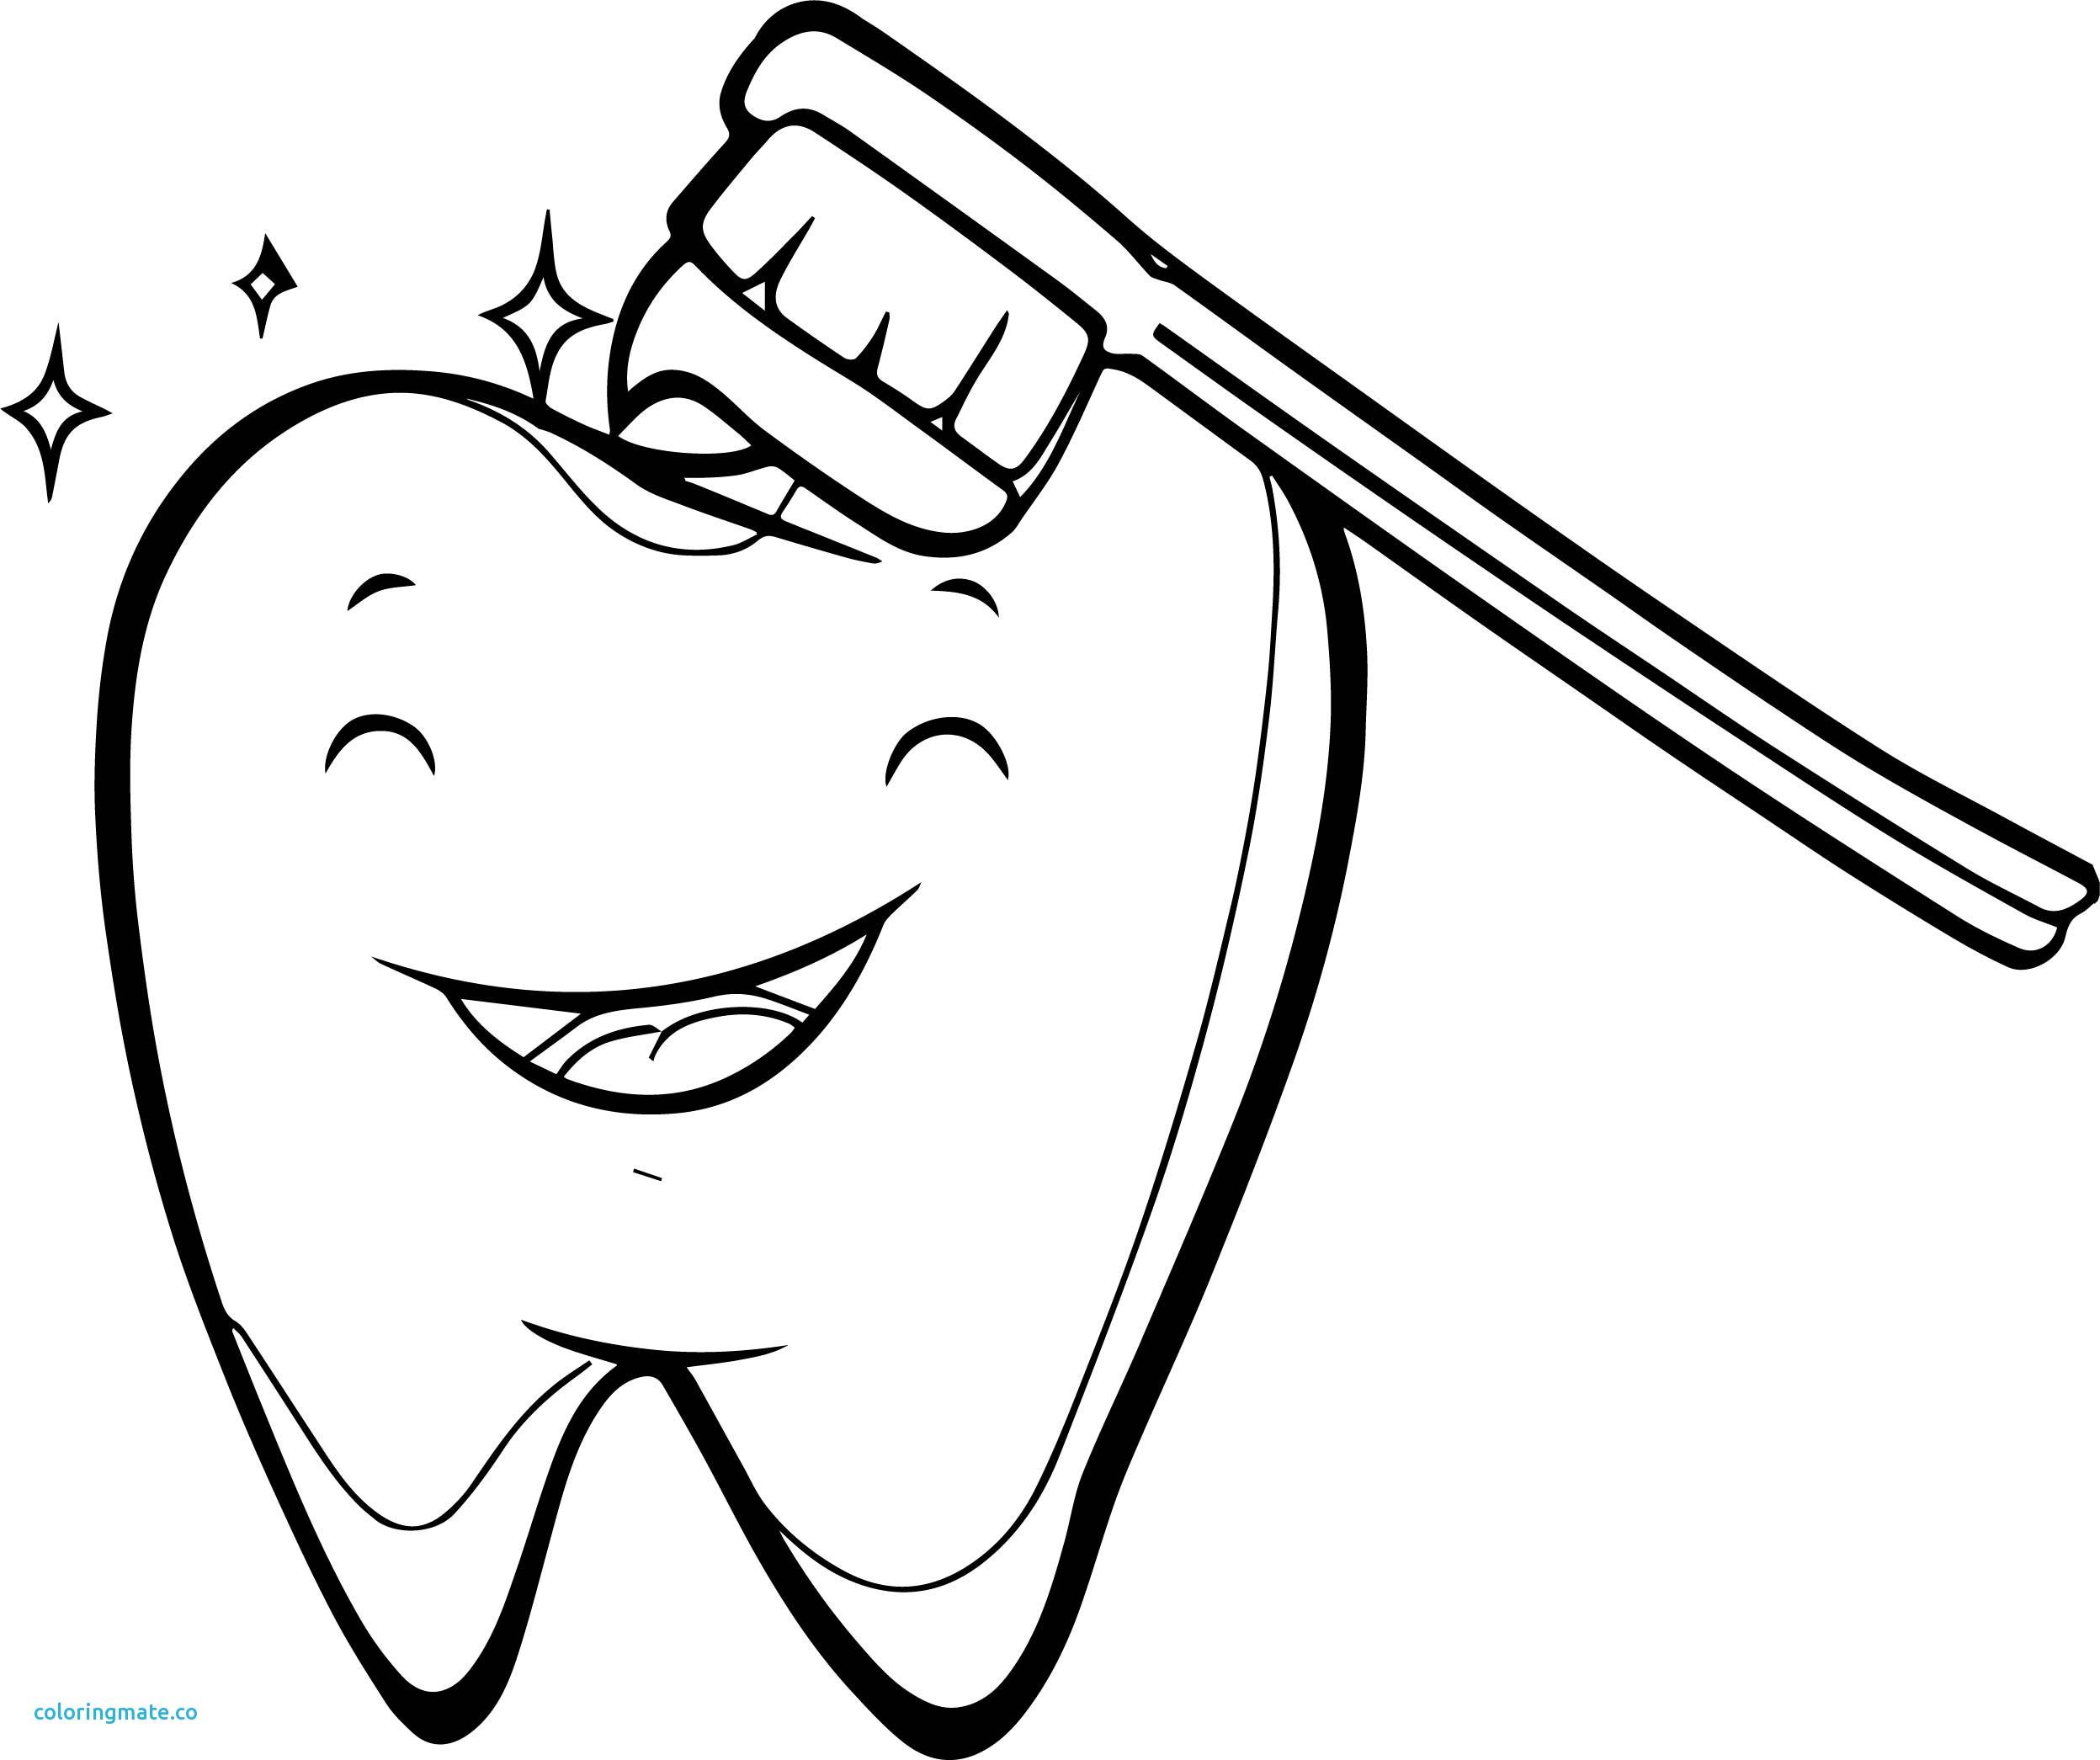 Brush Your Teeth Drawing At Getdrawings